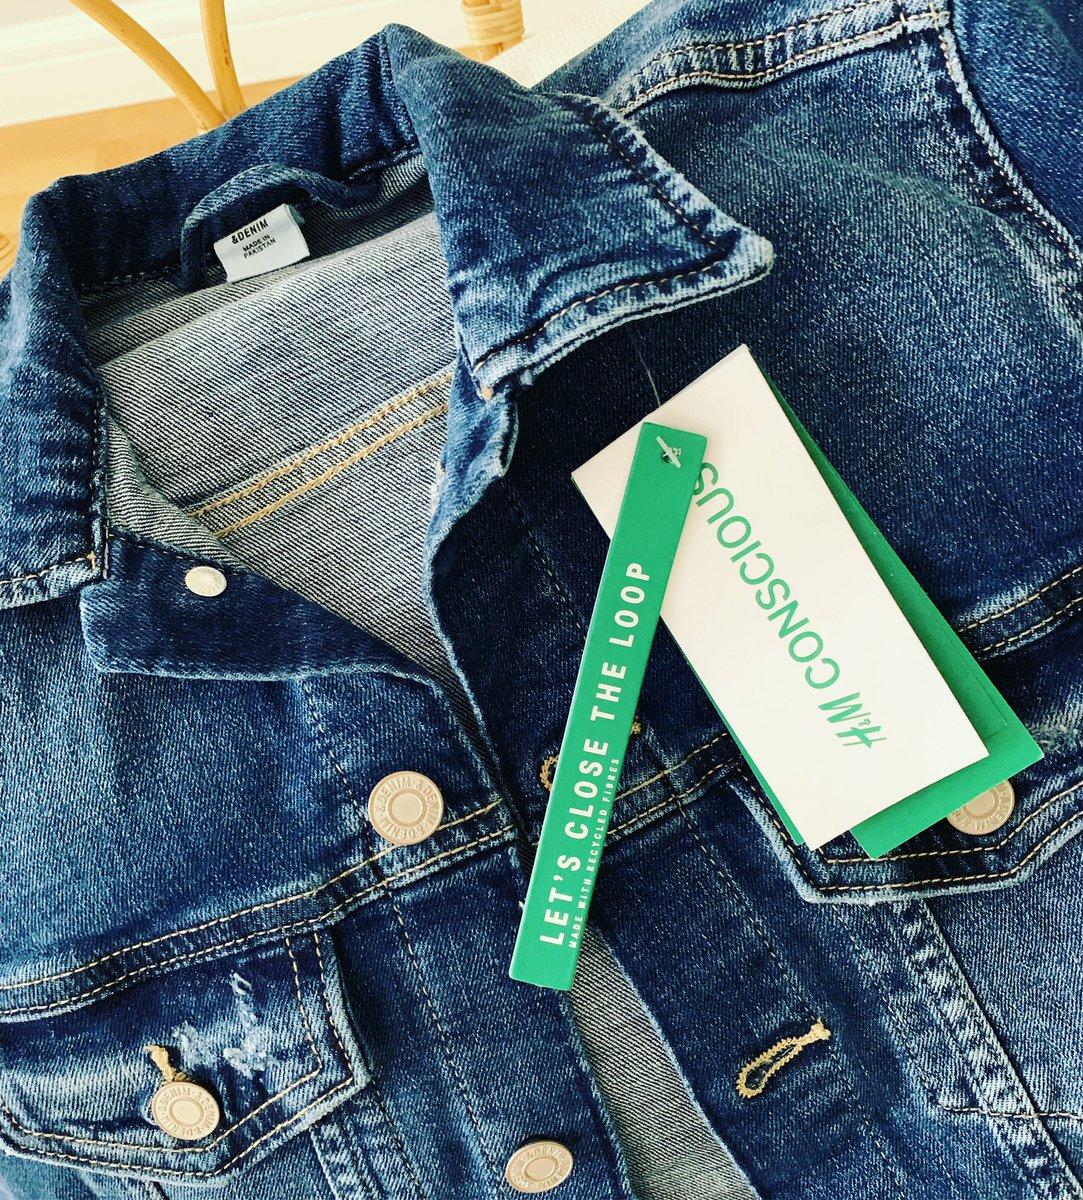 Let's close the loop! 🙋♀️💚🌎♻️ #hmconscious 👏👏👏 #HM #circular #recycled #fibres #smallsteps #bigimpact https://t.co/0GiUr8Irlh